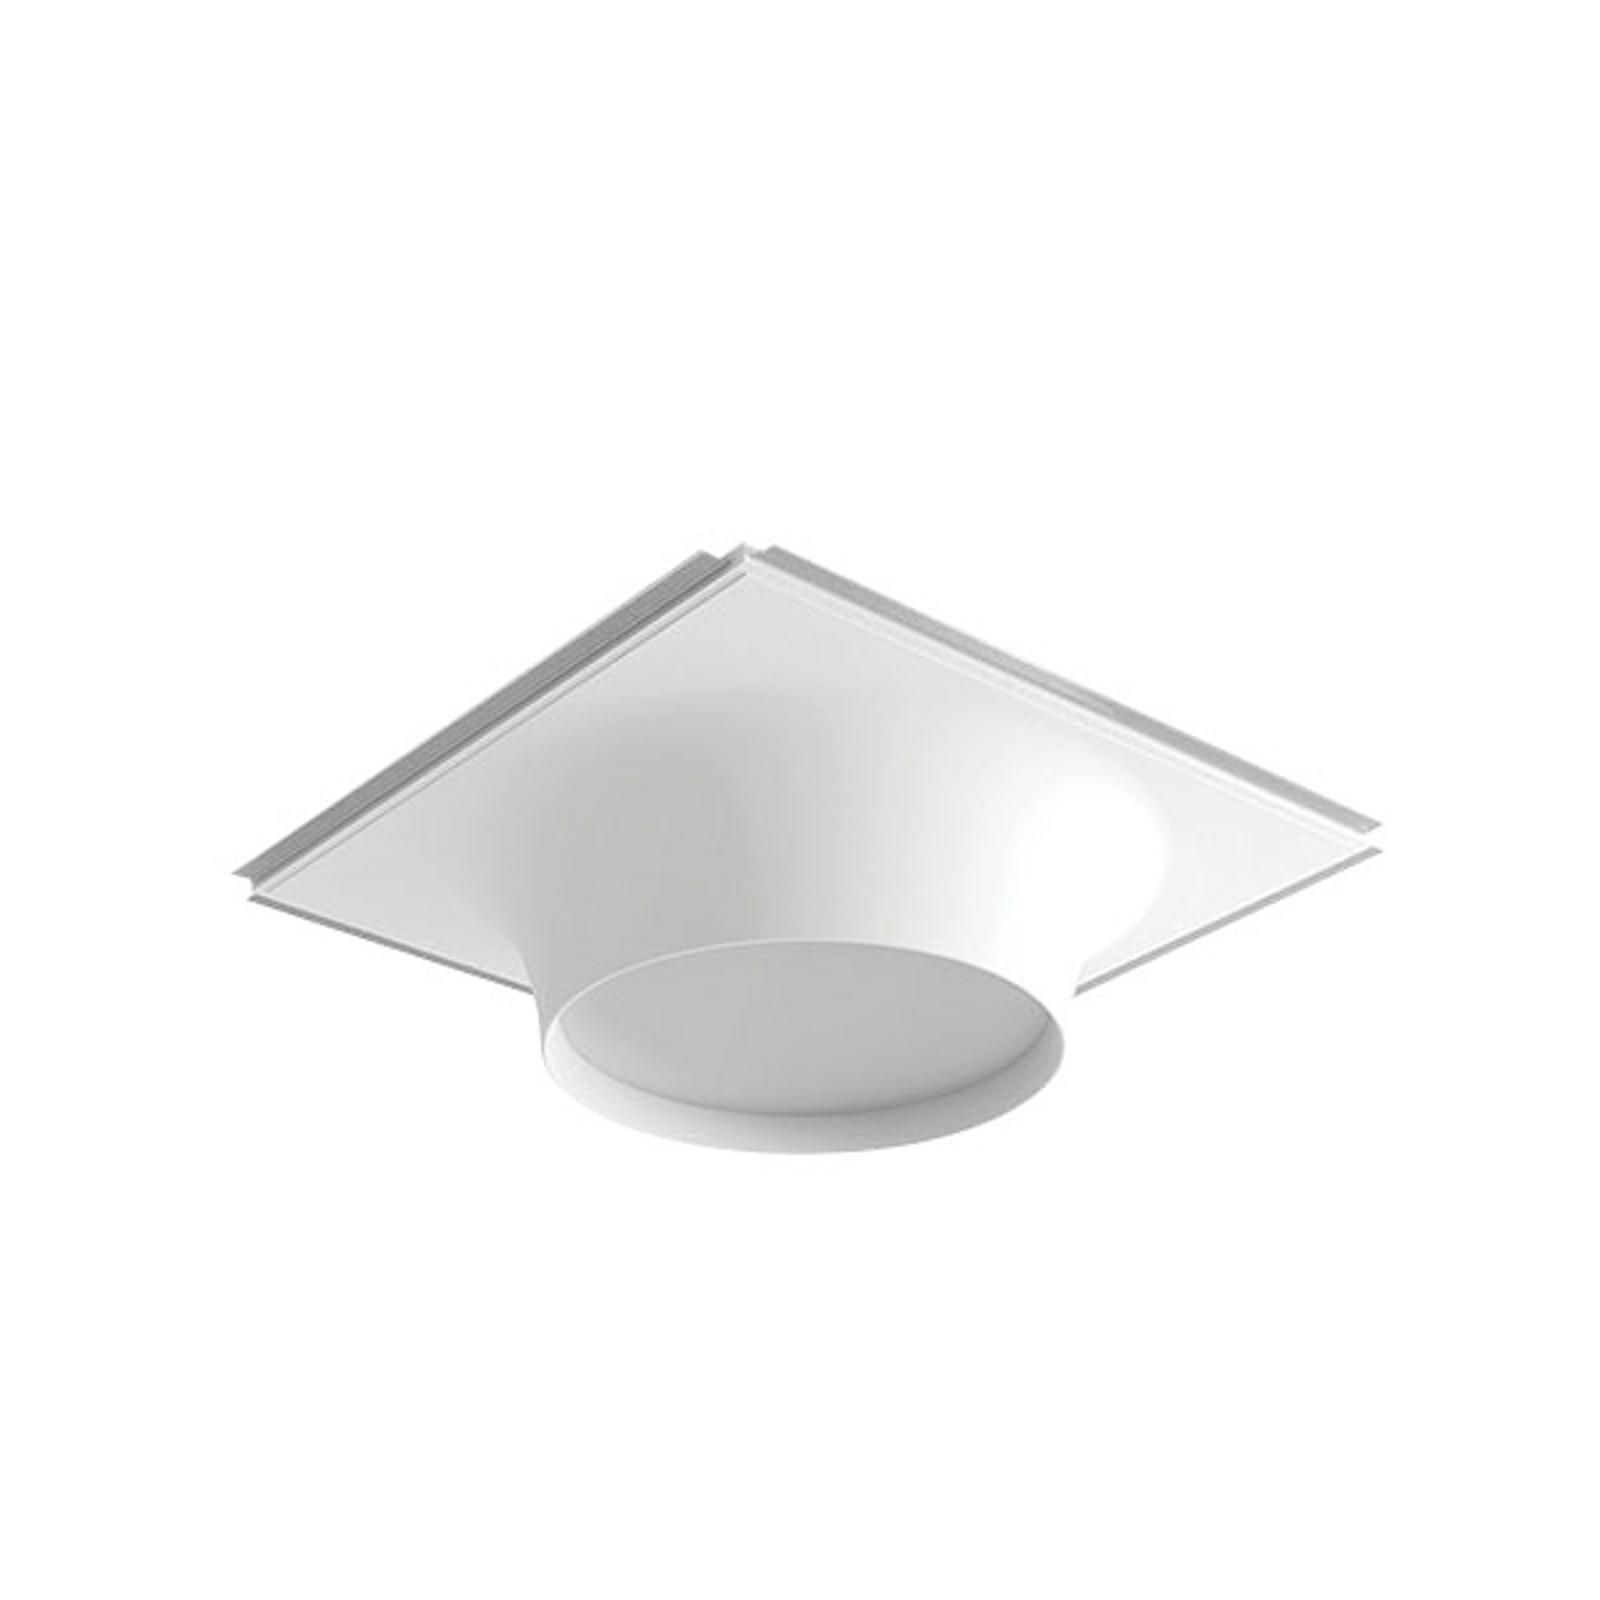 LED-plafond inbouwlamp 8935B, 2.700K, 68x68cm